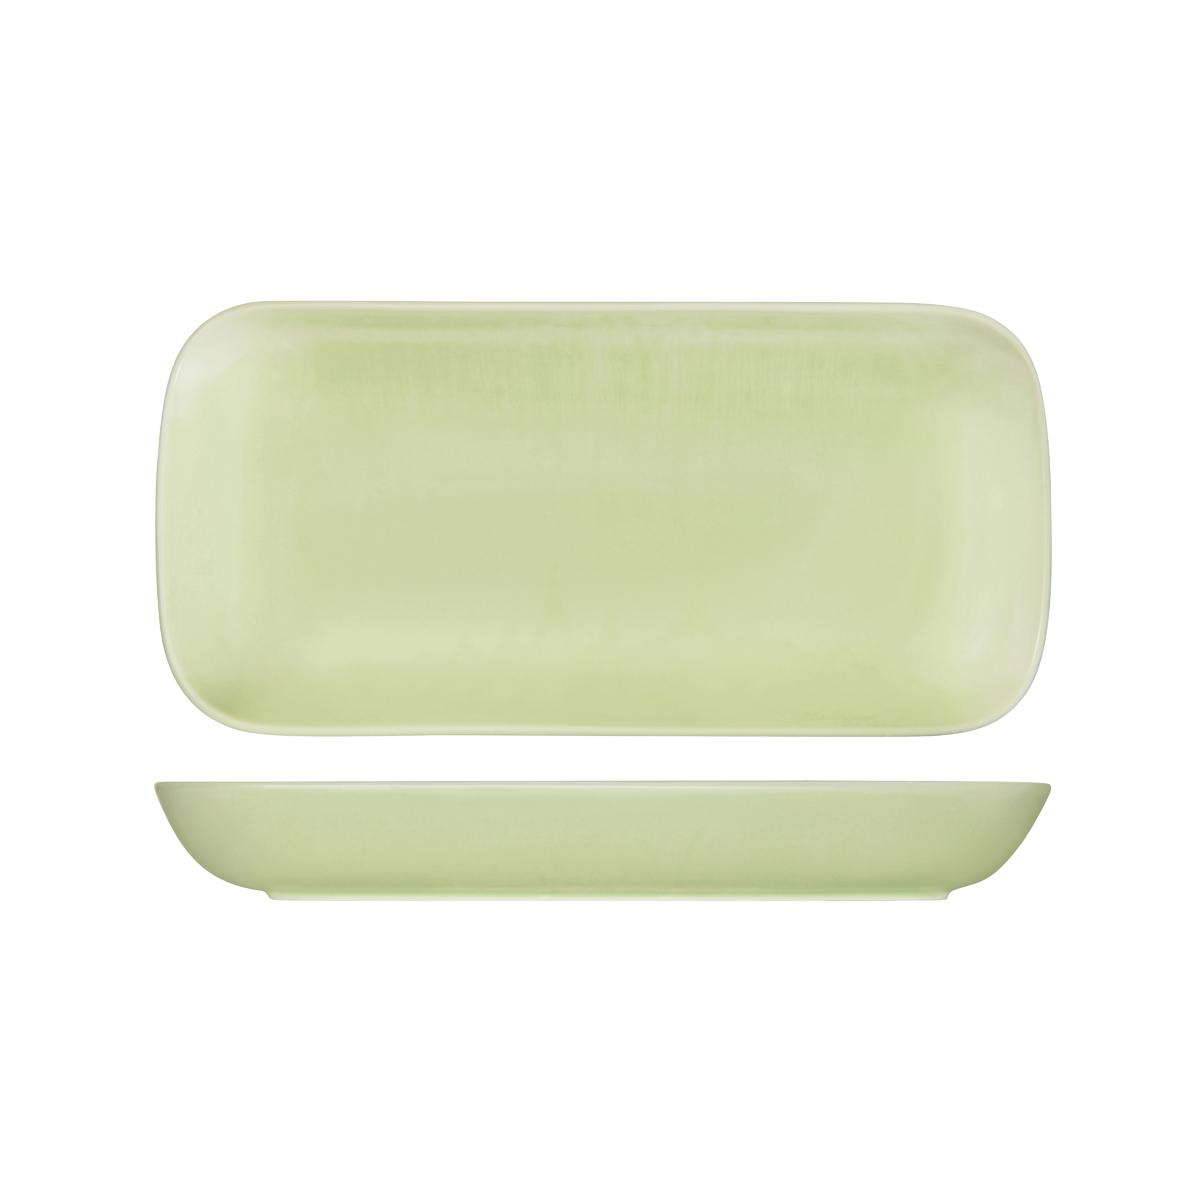 Moda Porcelain Lush Rectangle Dish 555/927523